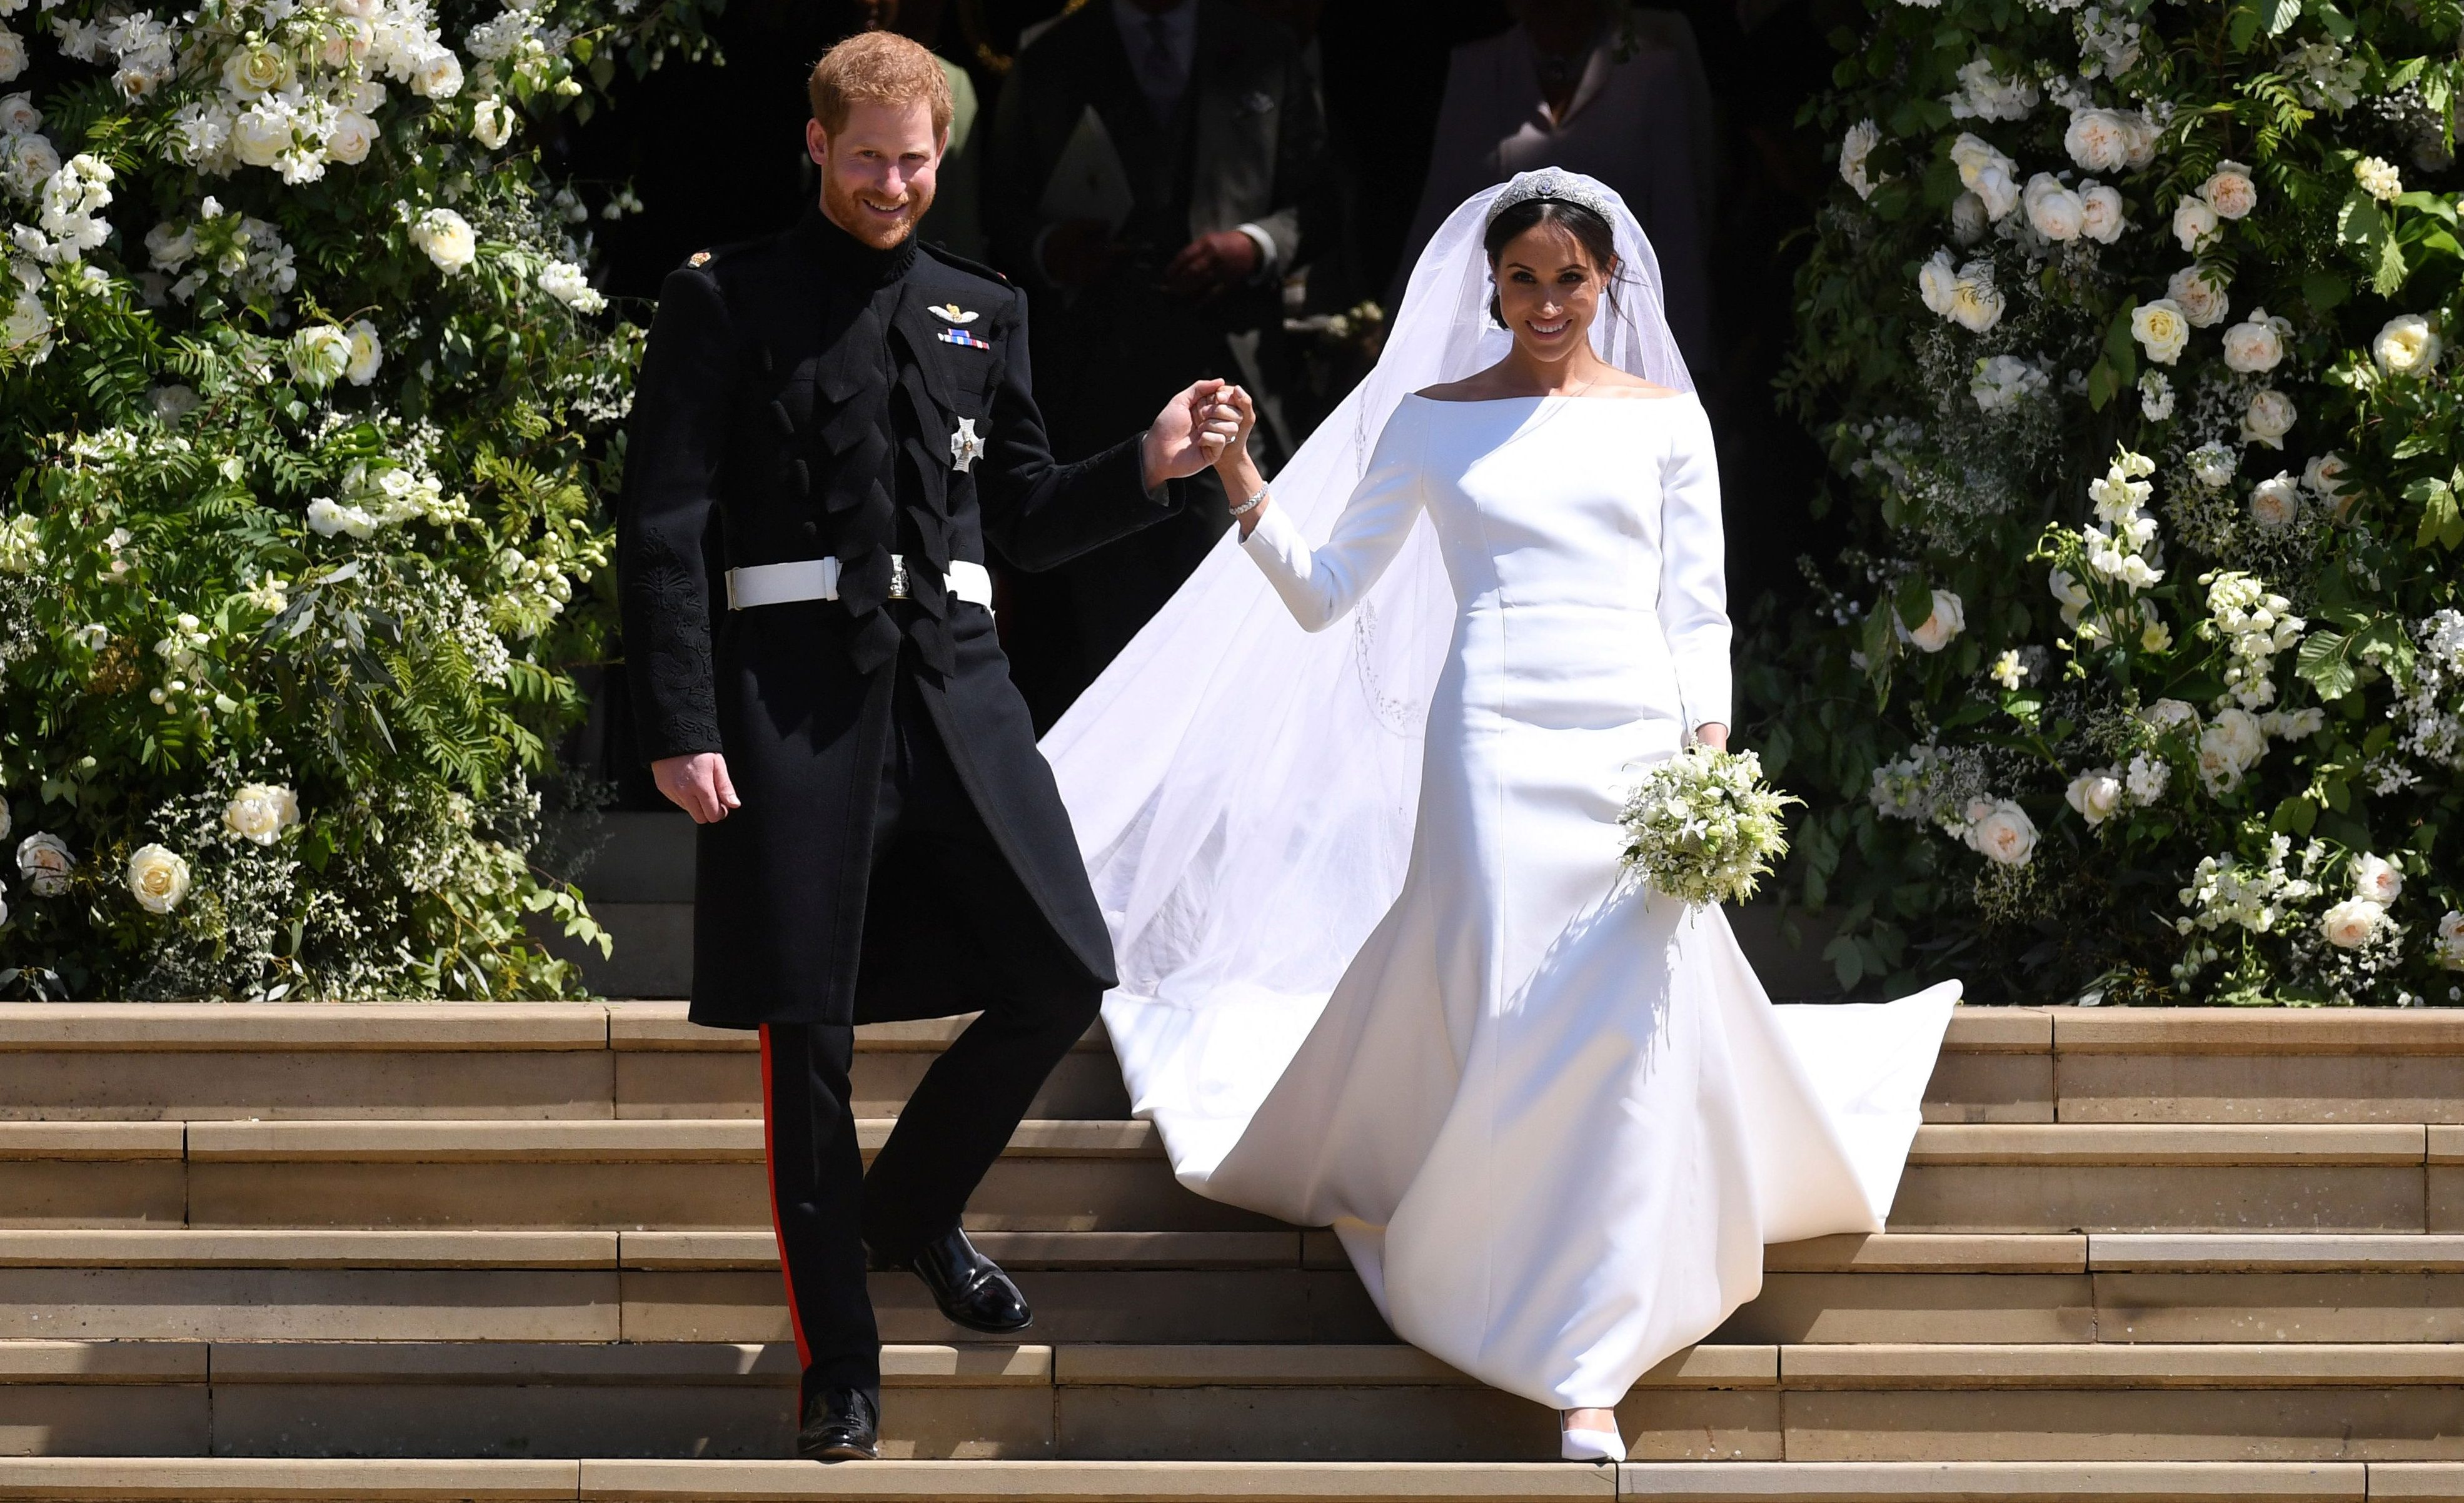 Real Royal Weddings: Royal Wedding 2018: The Ultimate Cheat Sheet To Pretend